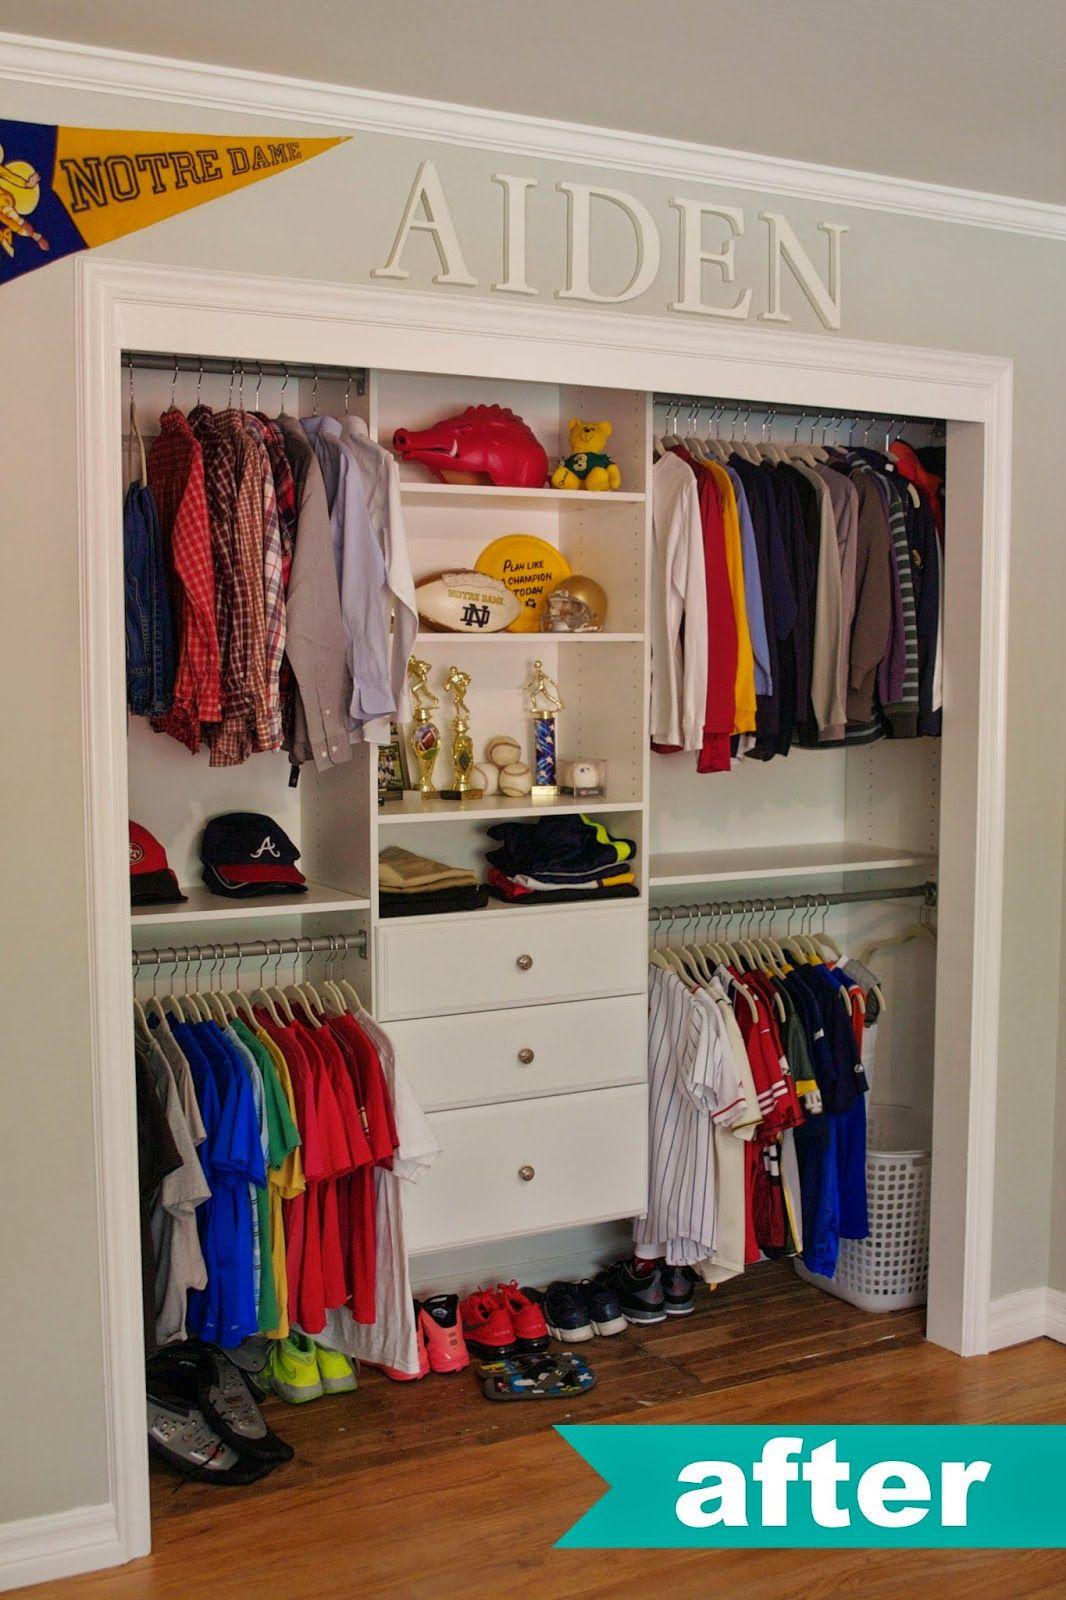 kids closet organization ideas. love name up top. HKFBMDG